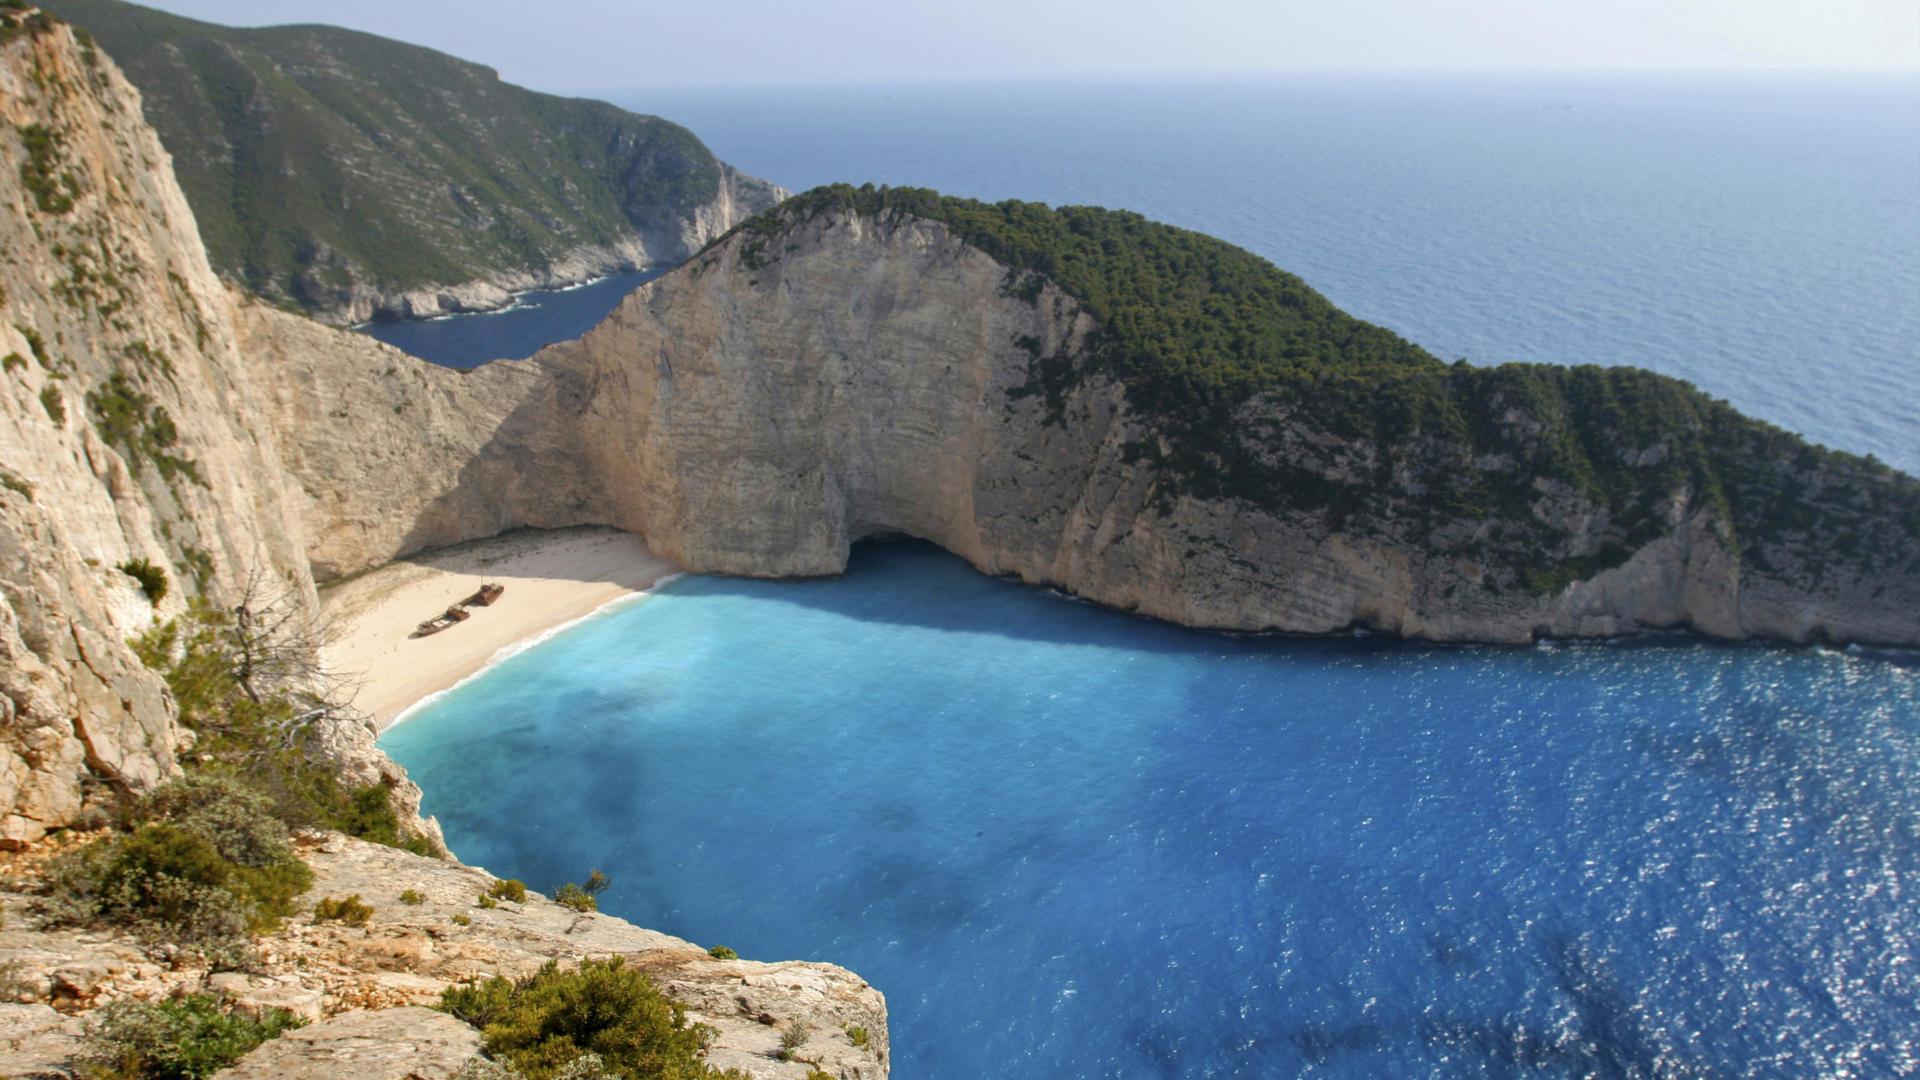 Wallpaper lagoon sand rock crest greece zakynthos island 1920x1080